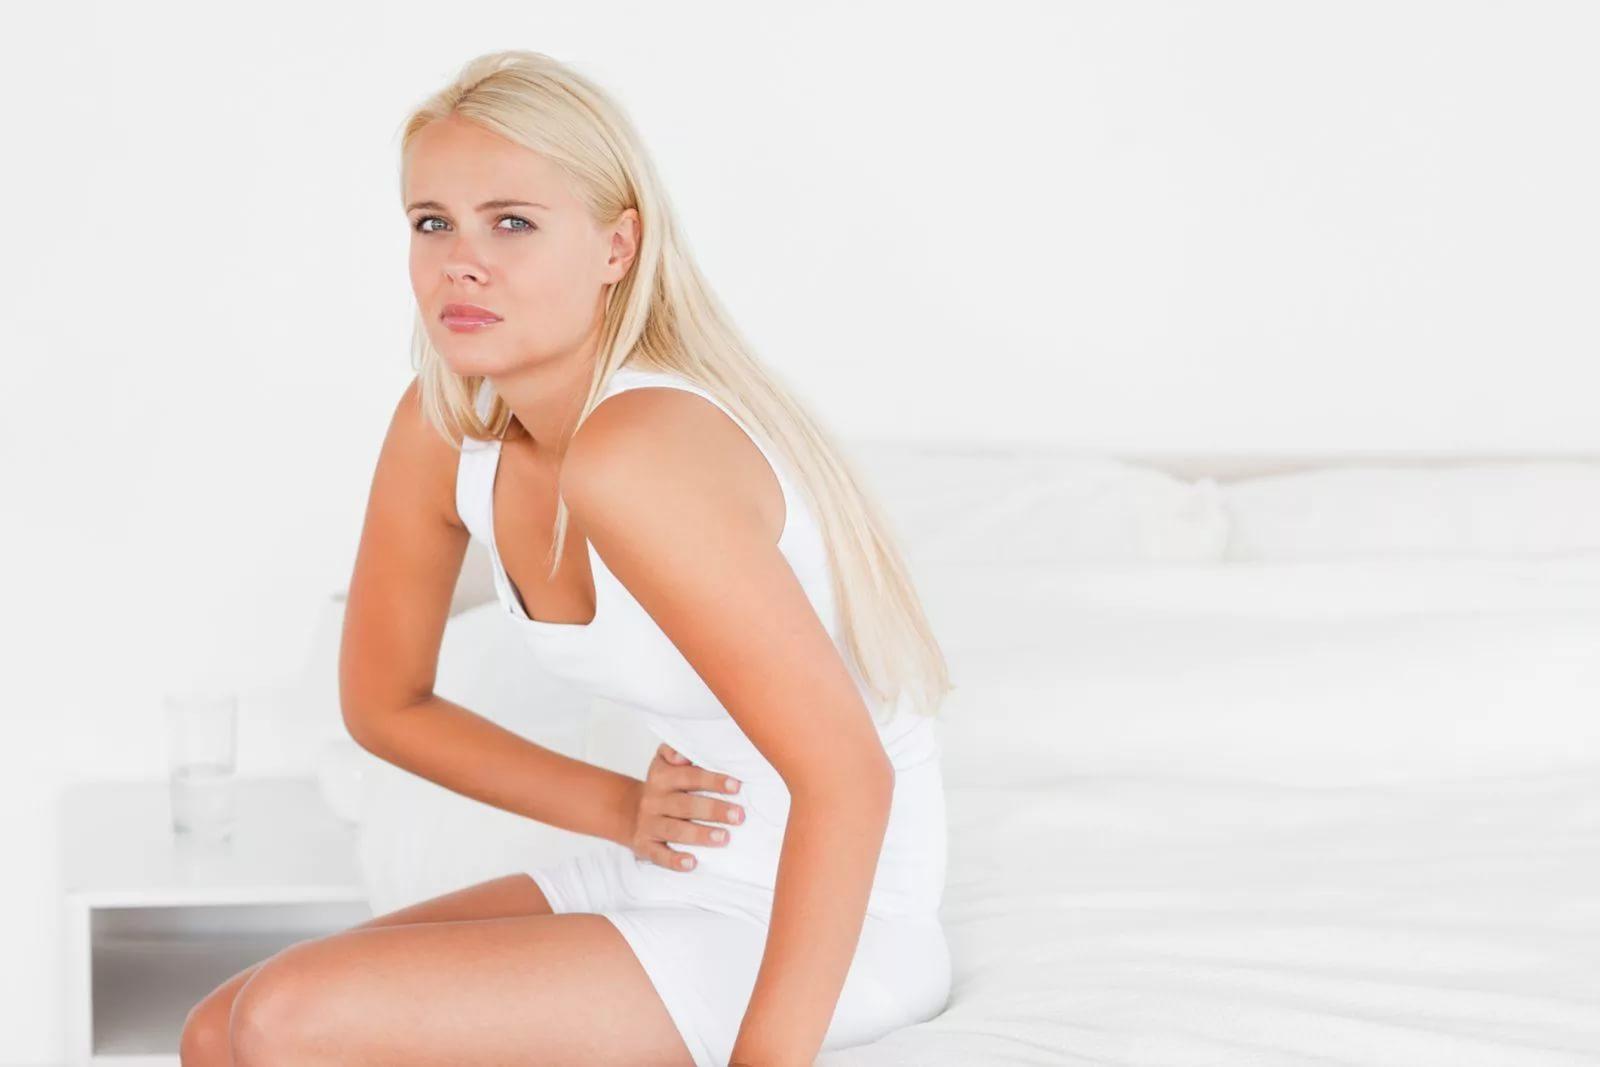 Миома матки и киста яичника: симптомы и лечение